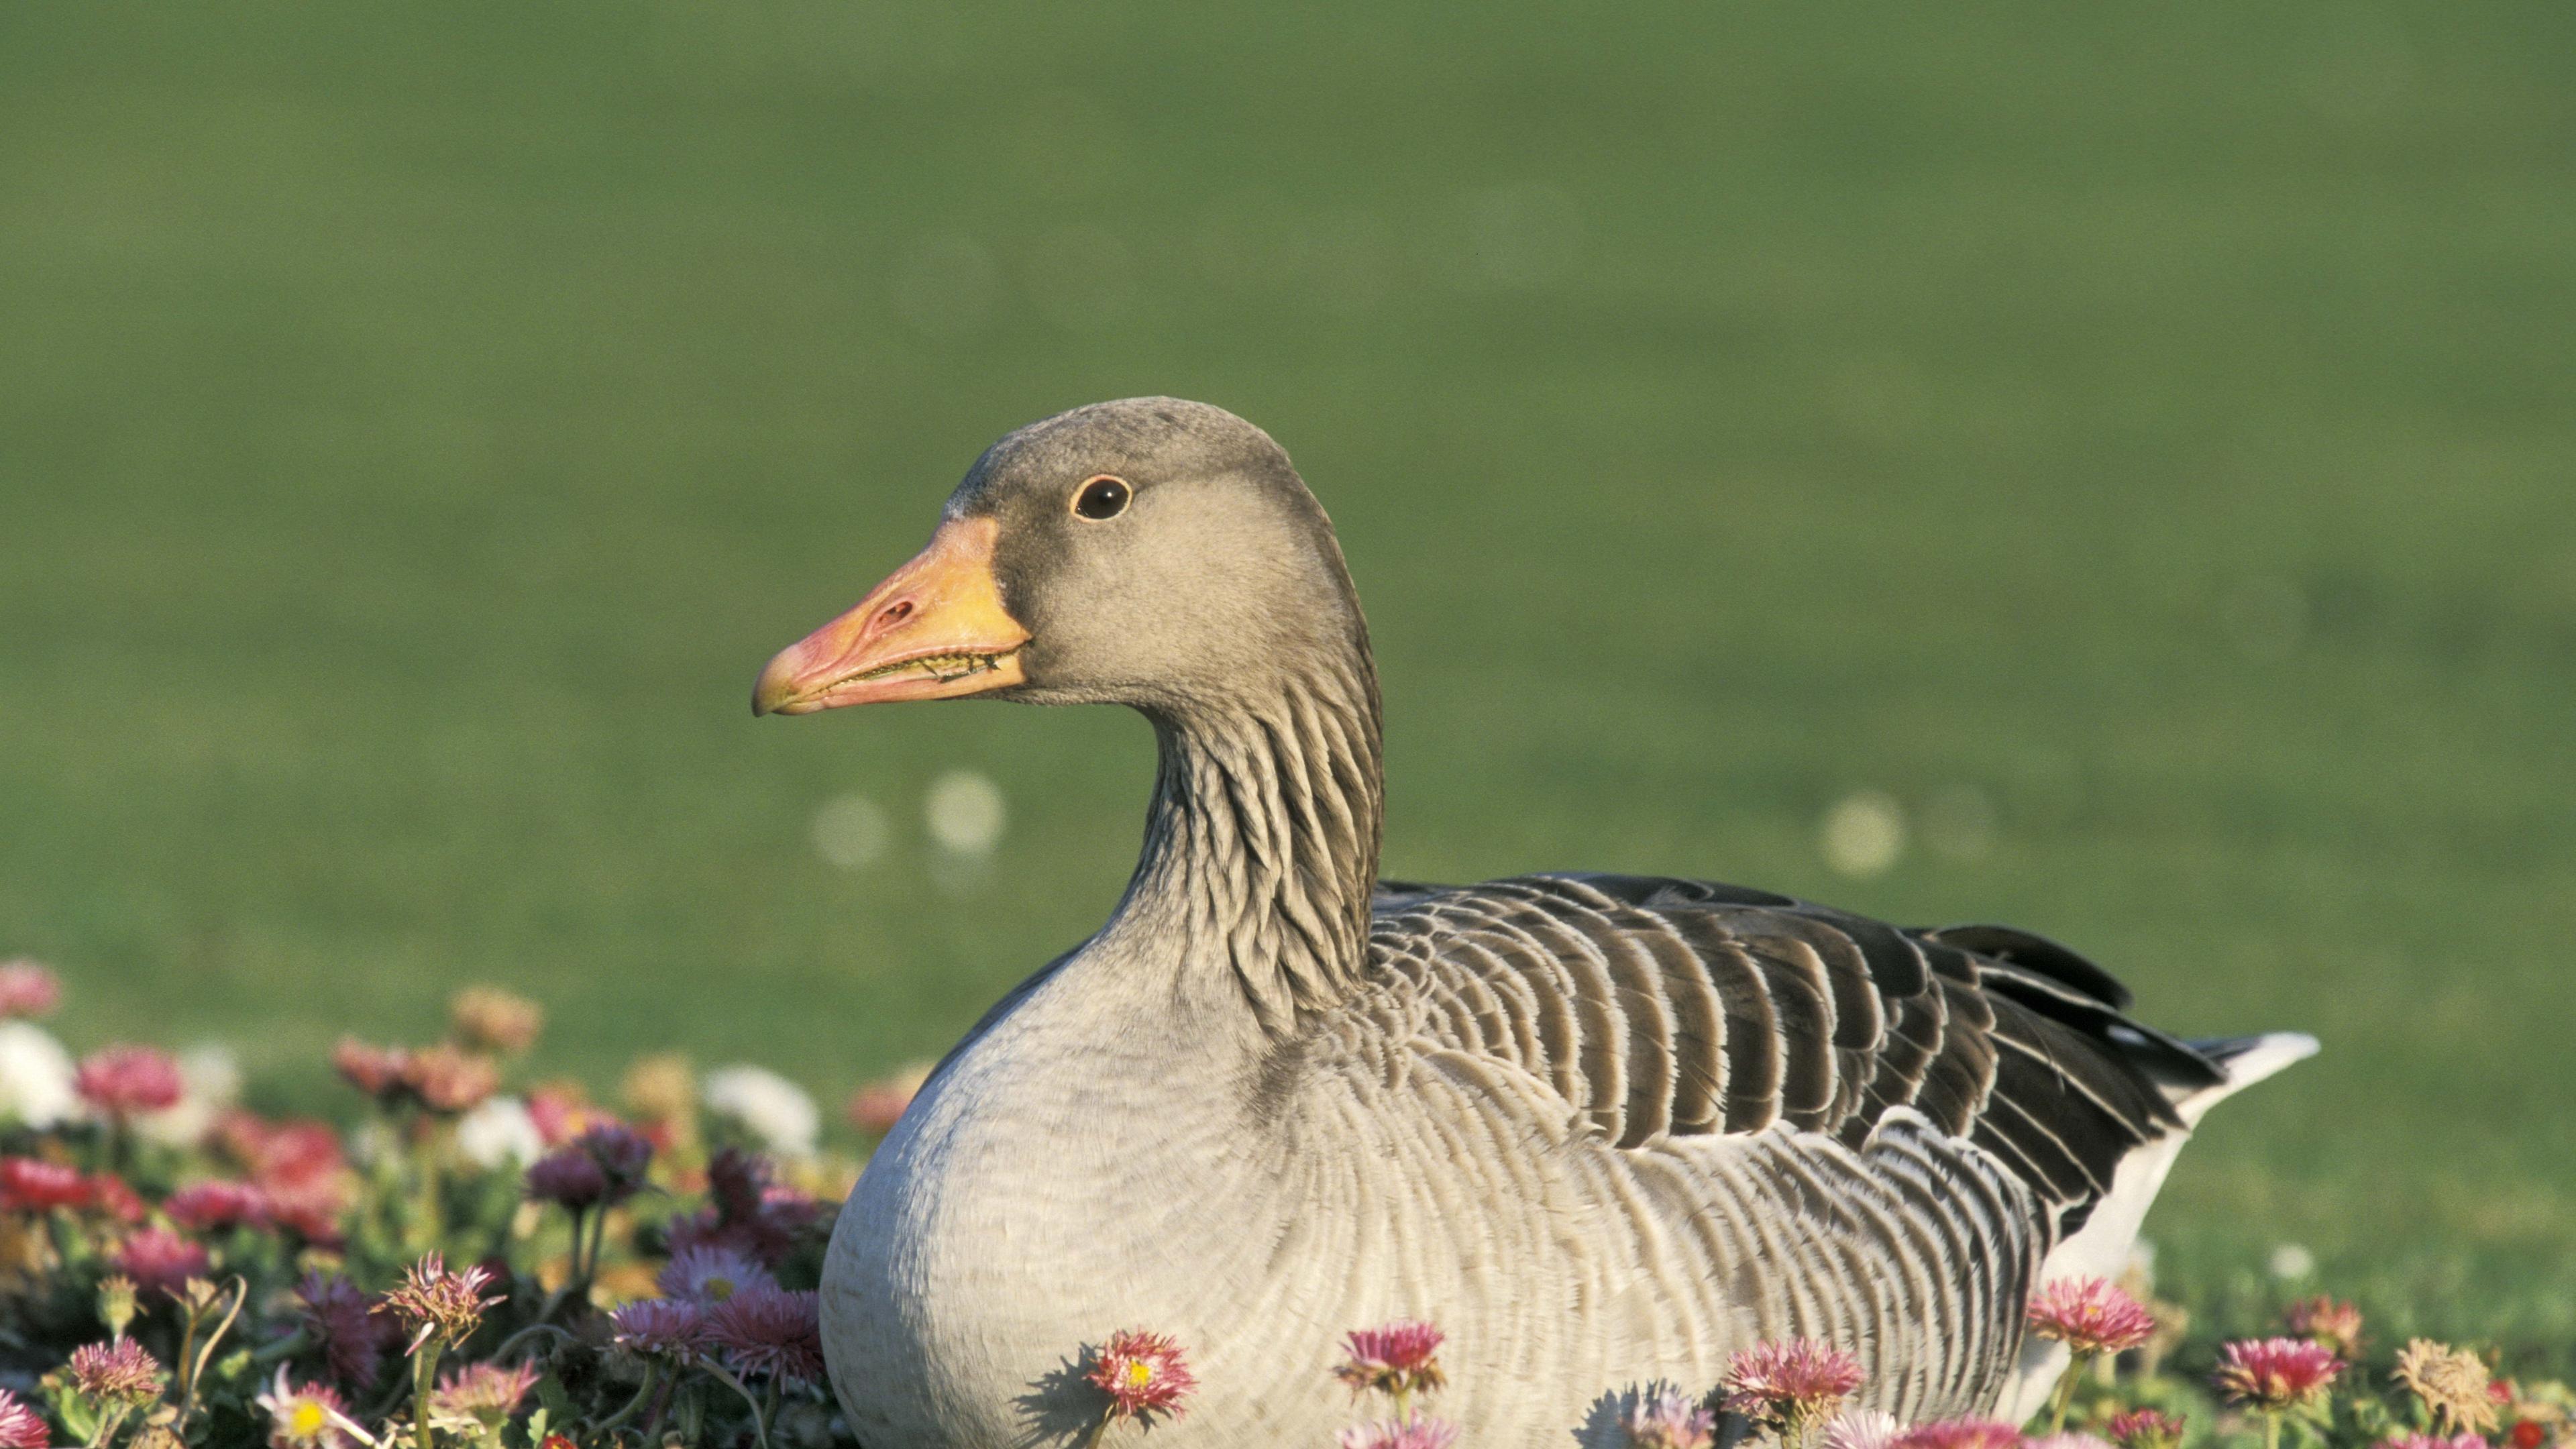 goose flowers bird 4k 1542242846 - goose, flowers, bird 4k - goose, Flowers, Bird